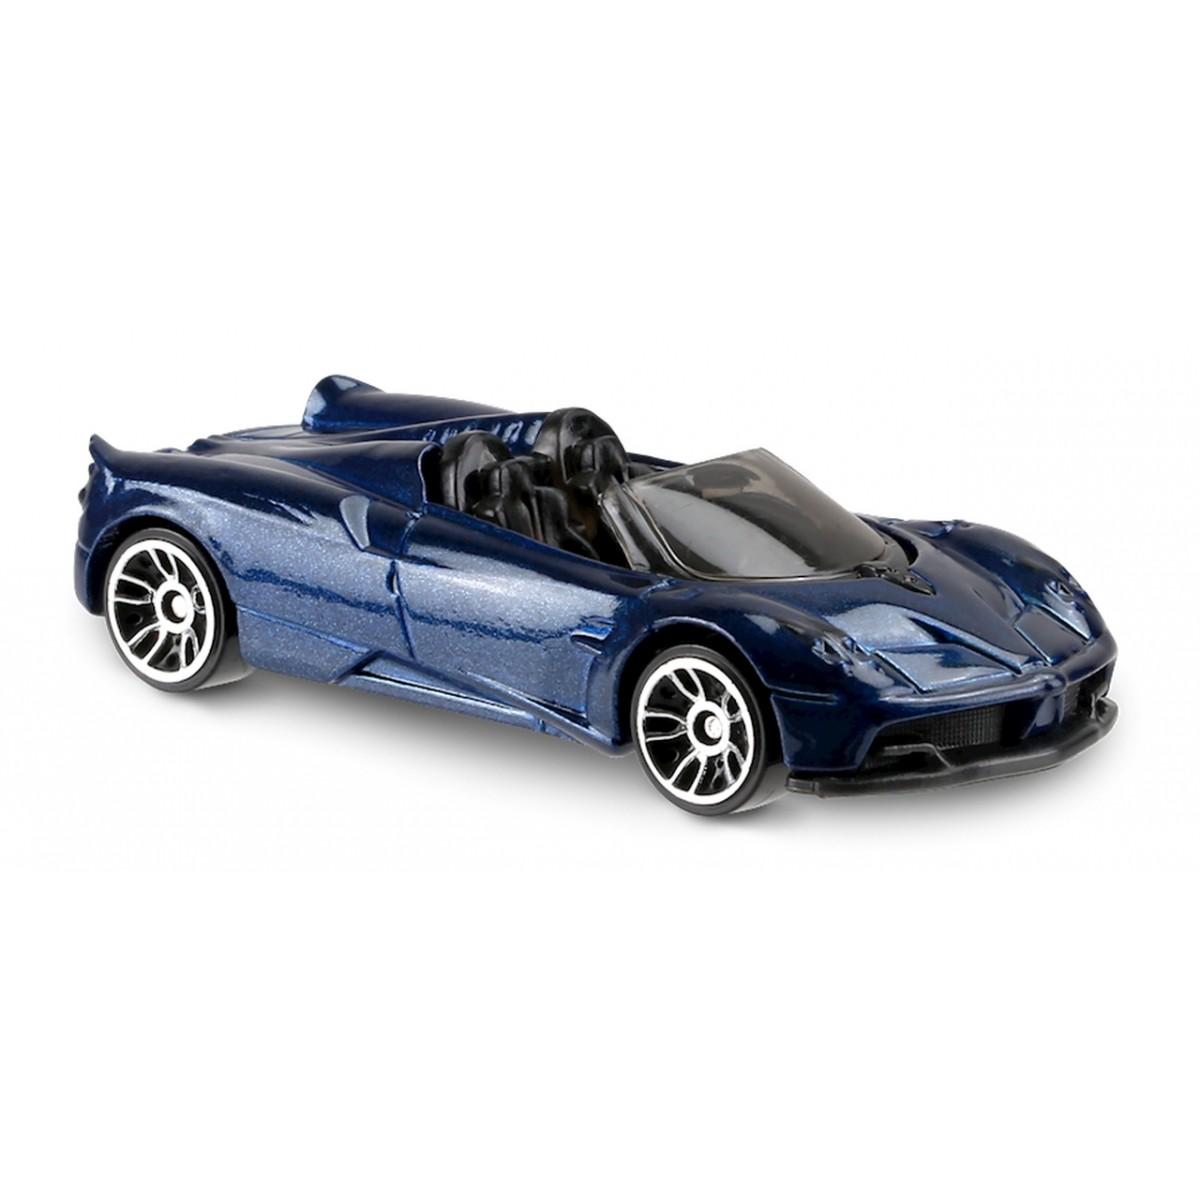 Carrinho Hot Wheels: '17 Pagani Huayra Roadster Azul